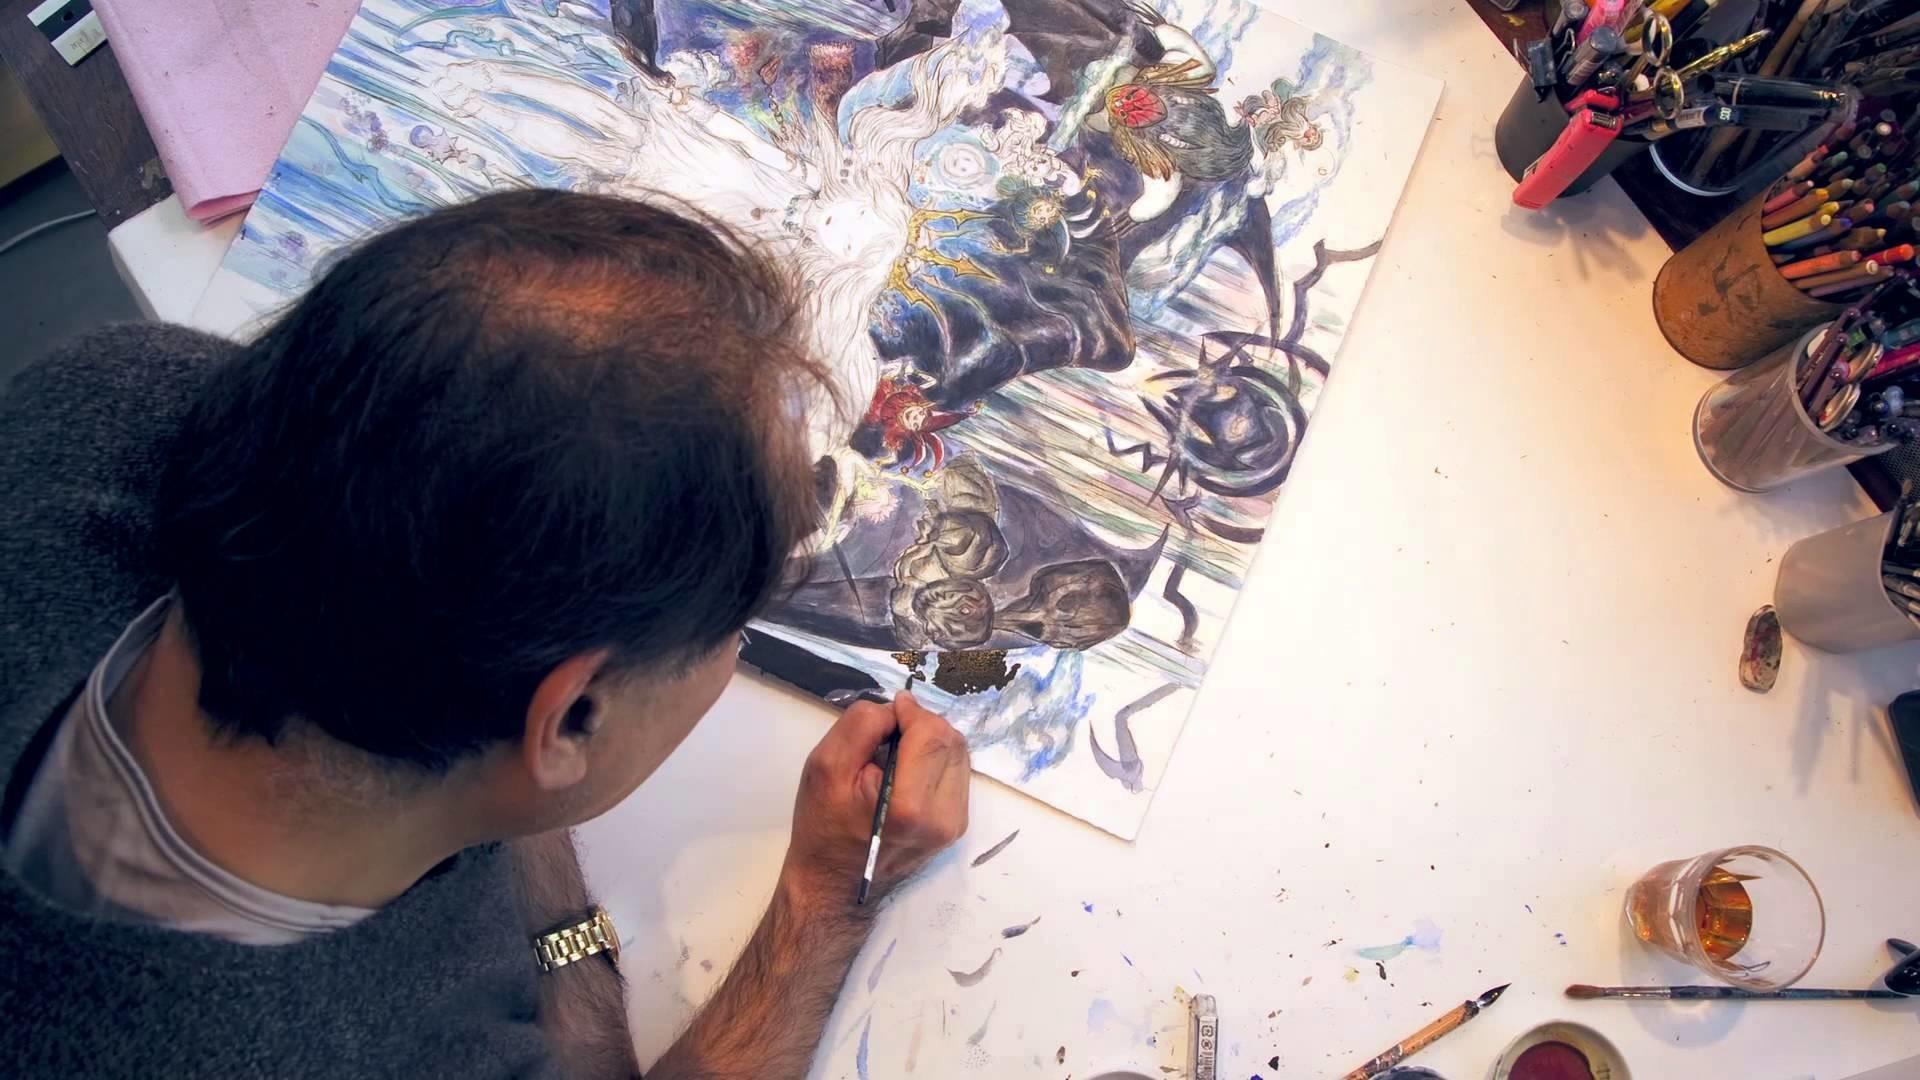 Child of Light Artwork Speed Painting Video ft. Artist Yoshitaka Amano –  YouTube